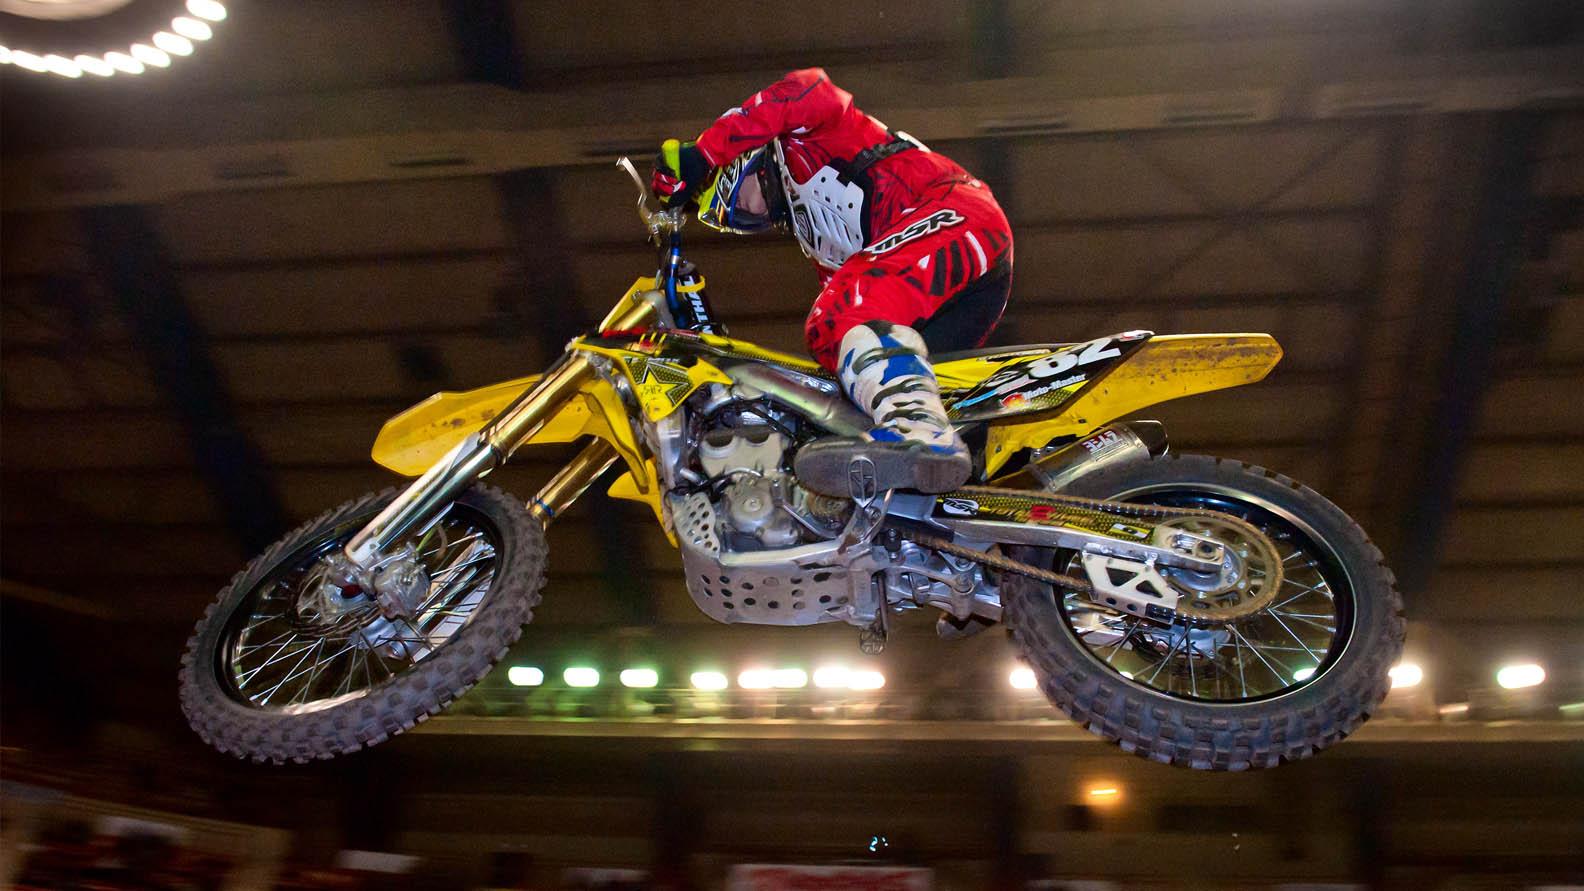 Arenacross bike taking flight at the 34th Annual Motorama - Ms Motorama - Harrisburg PA - Main Arena, Pennsylvania Farm Show Complex